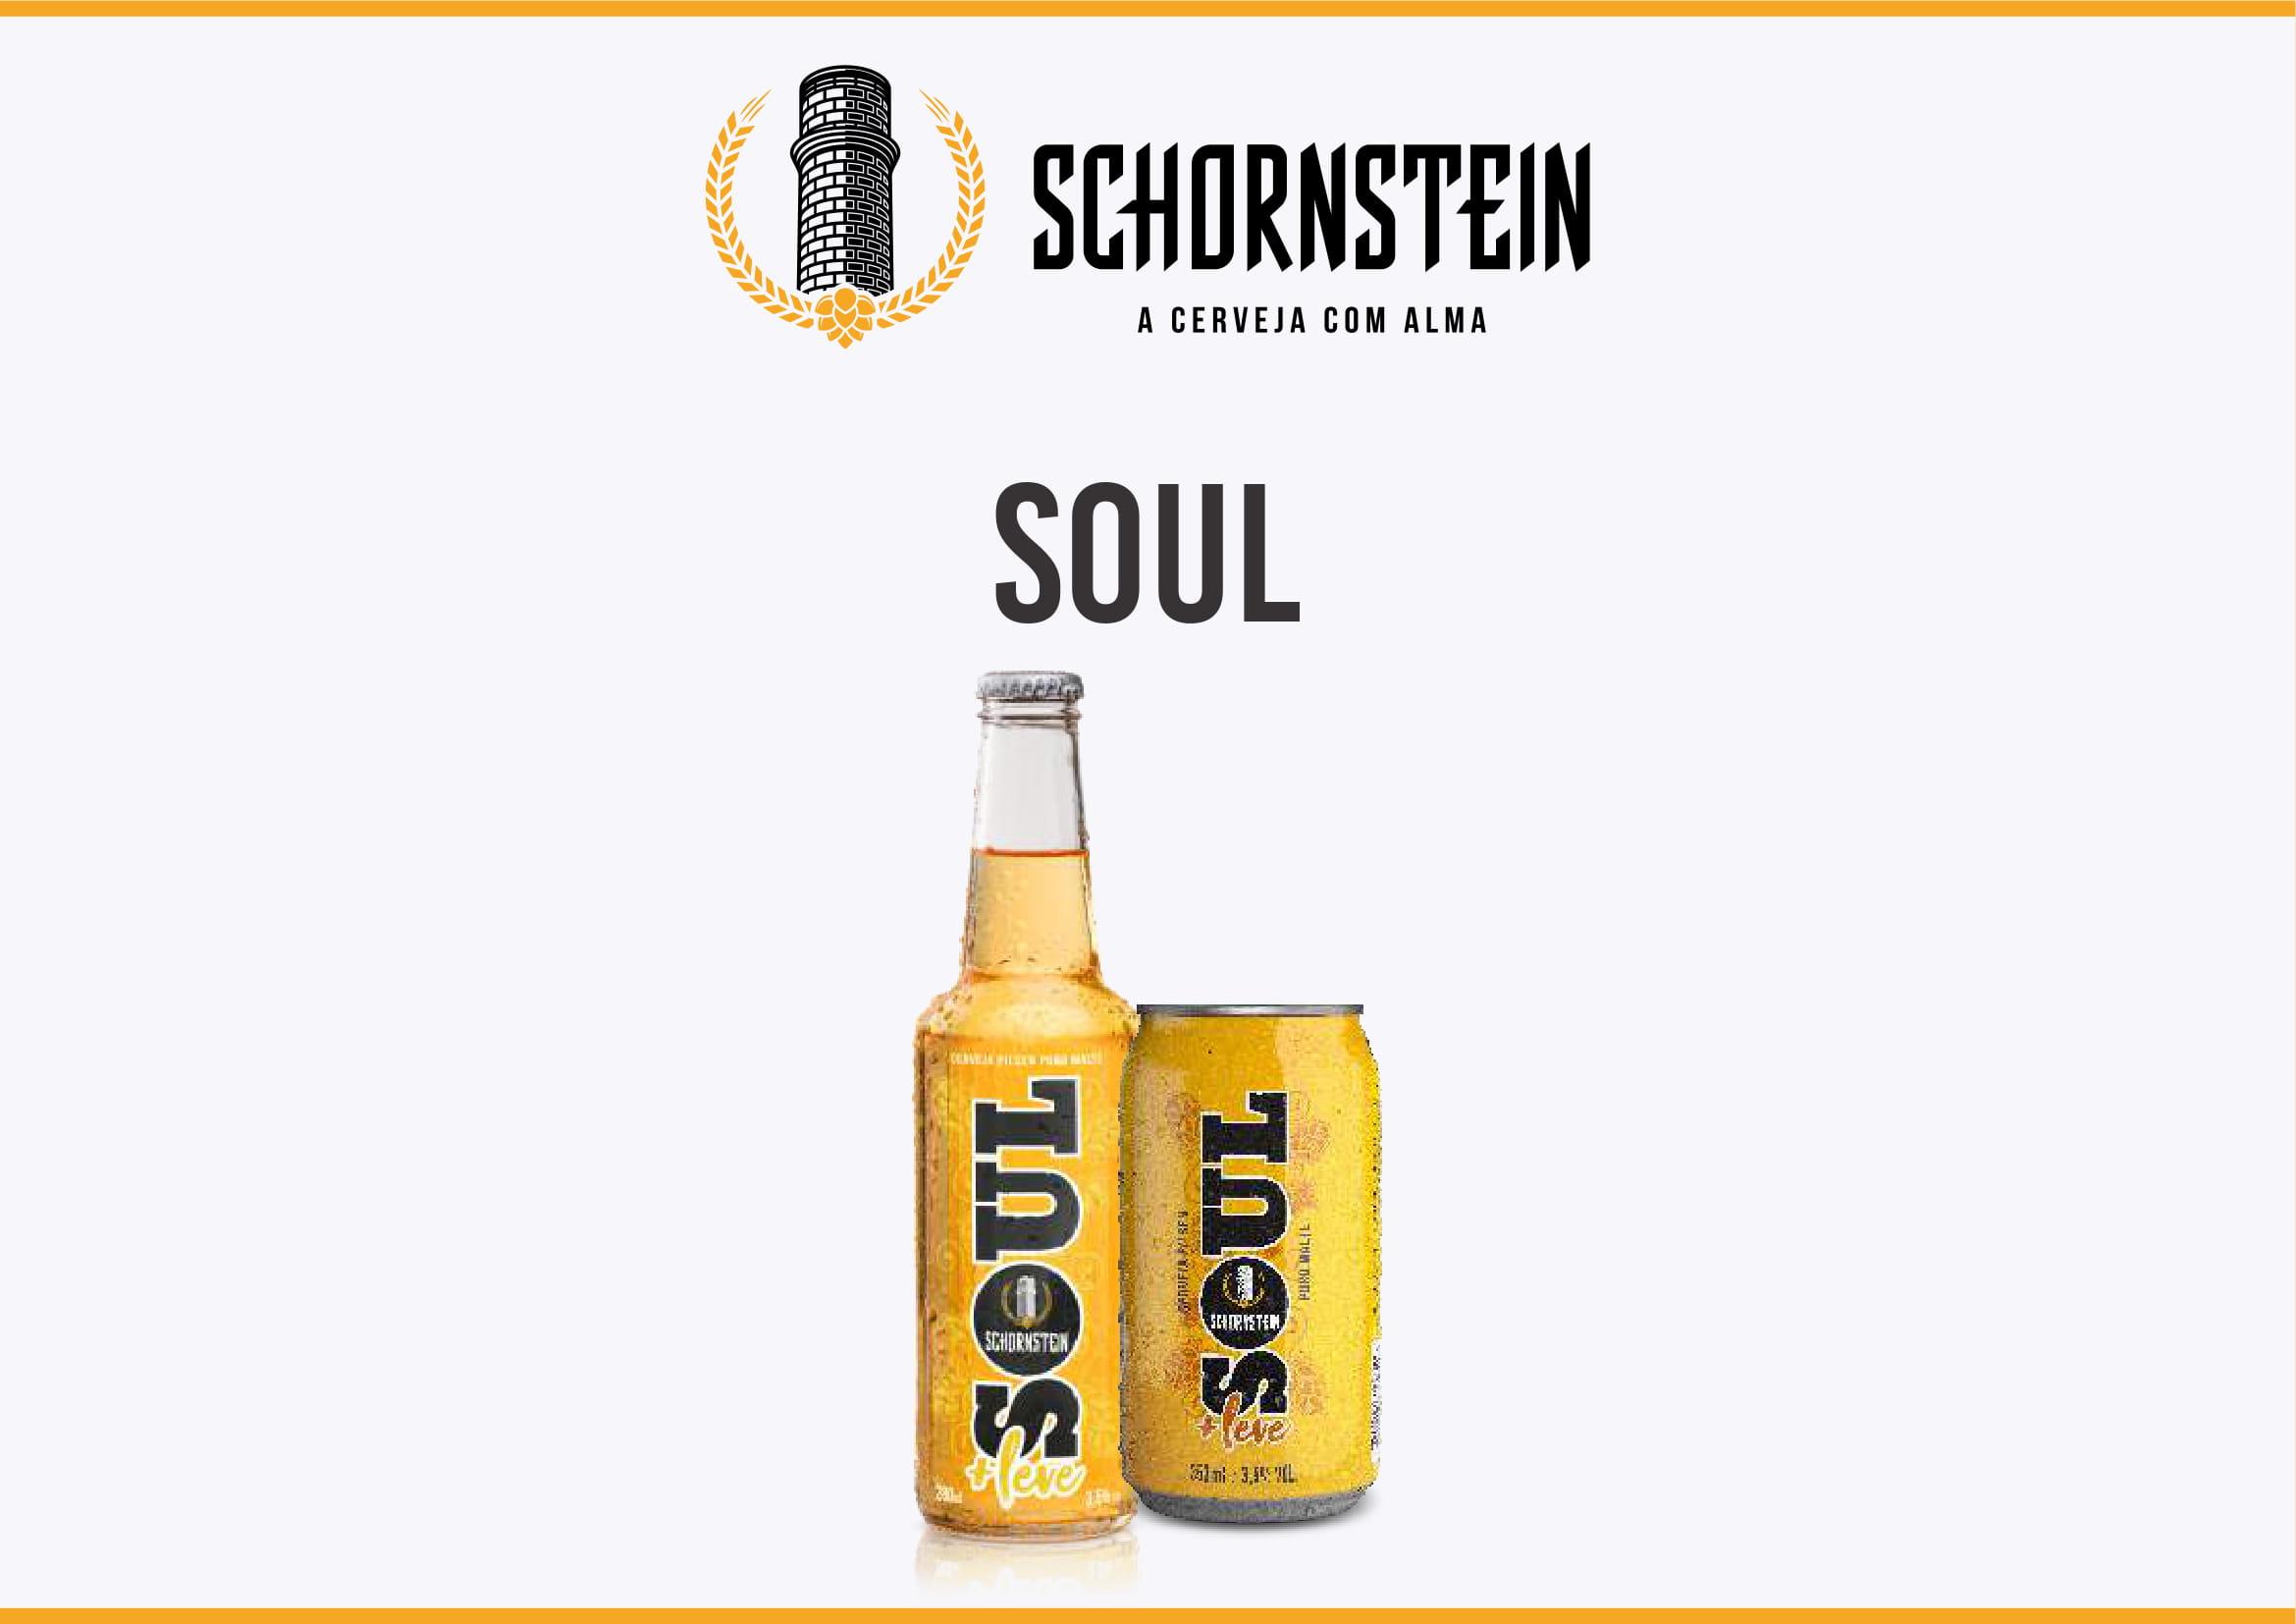 Schornstein Soul Long neck